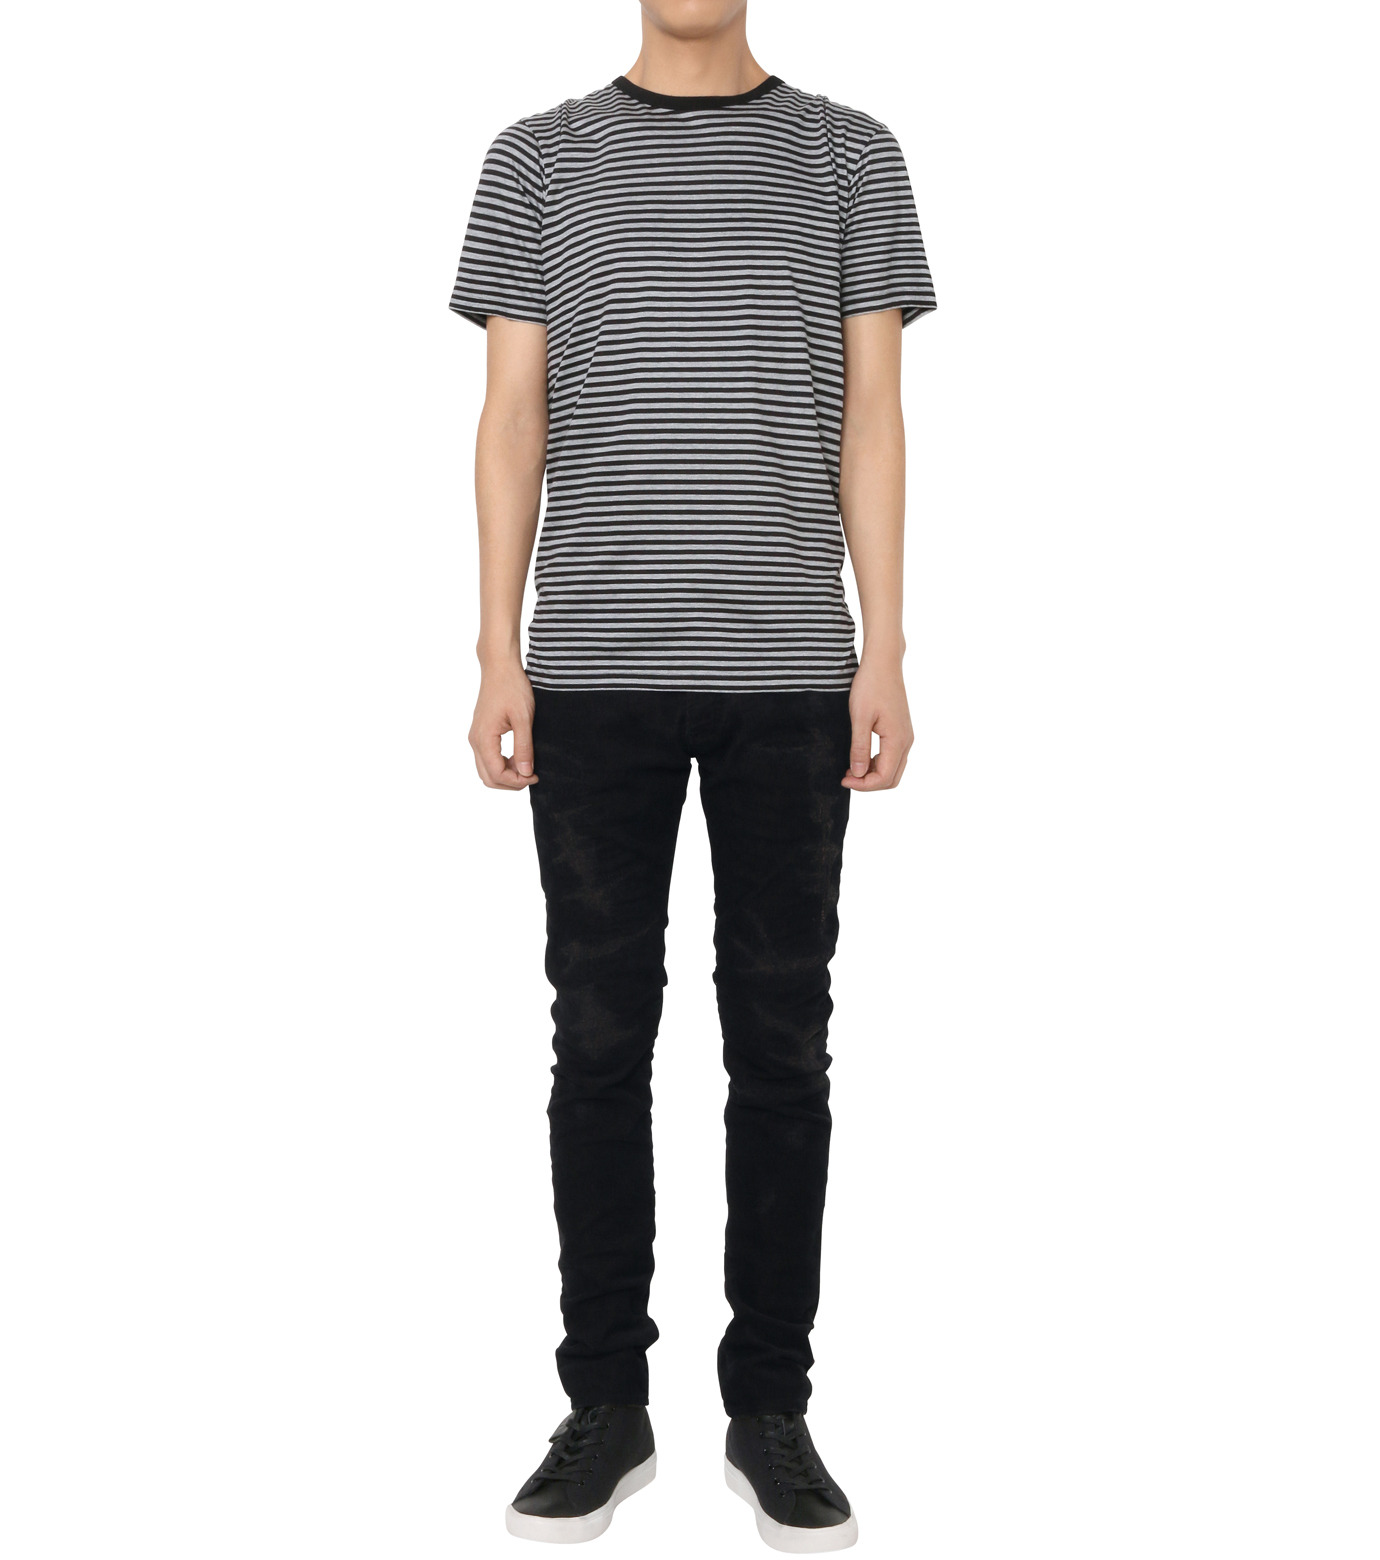 HL HEDDIE LOVU(エイチエル・エディールーヴ)のBLACK CORDUROY DAMAGE PANTS-BLACK(パンツ/pants)-18A98001-13 拡大詳細画像2